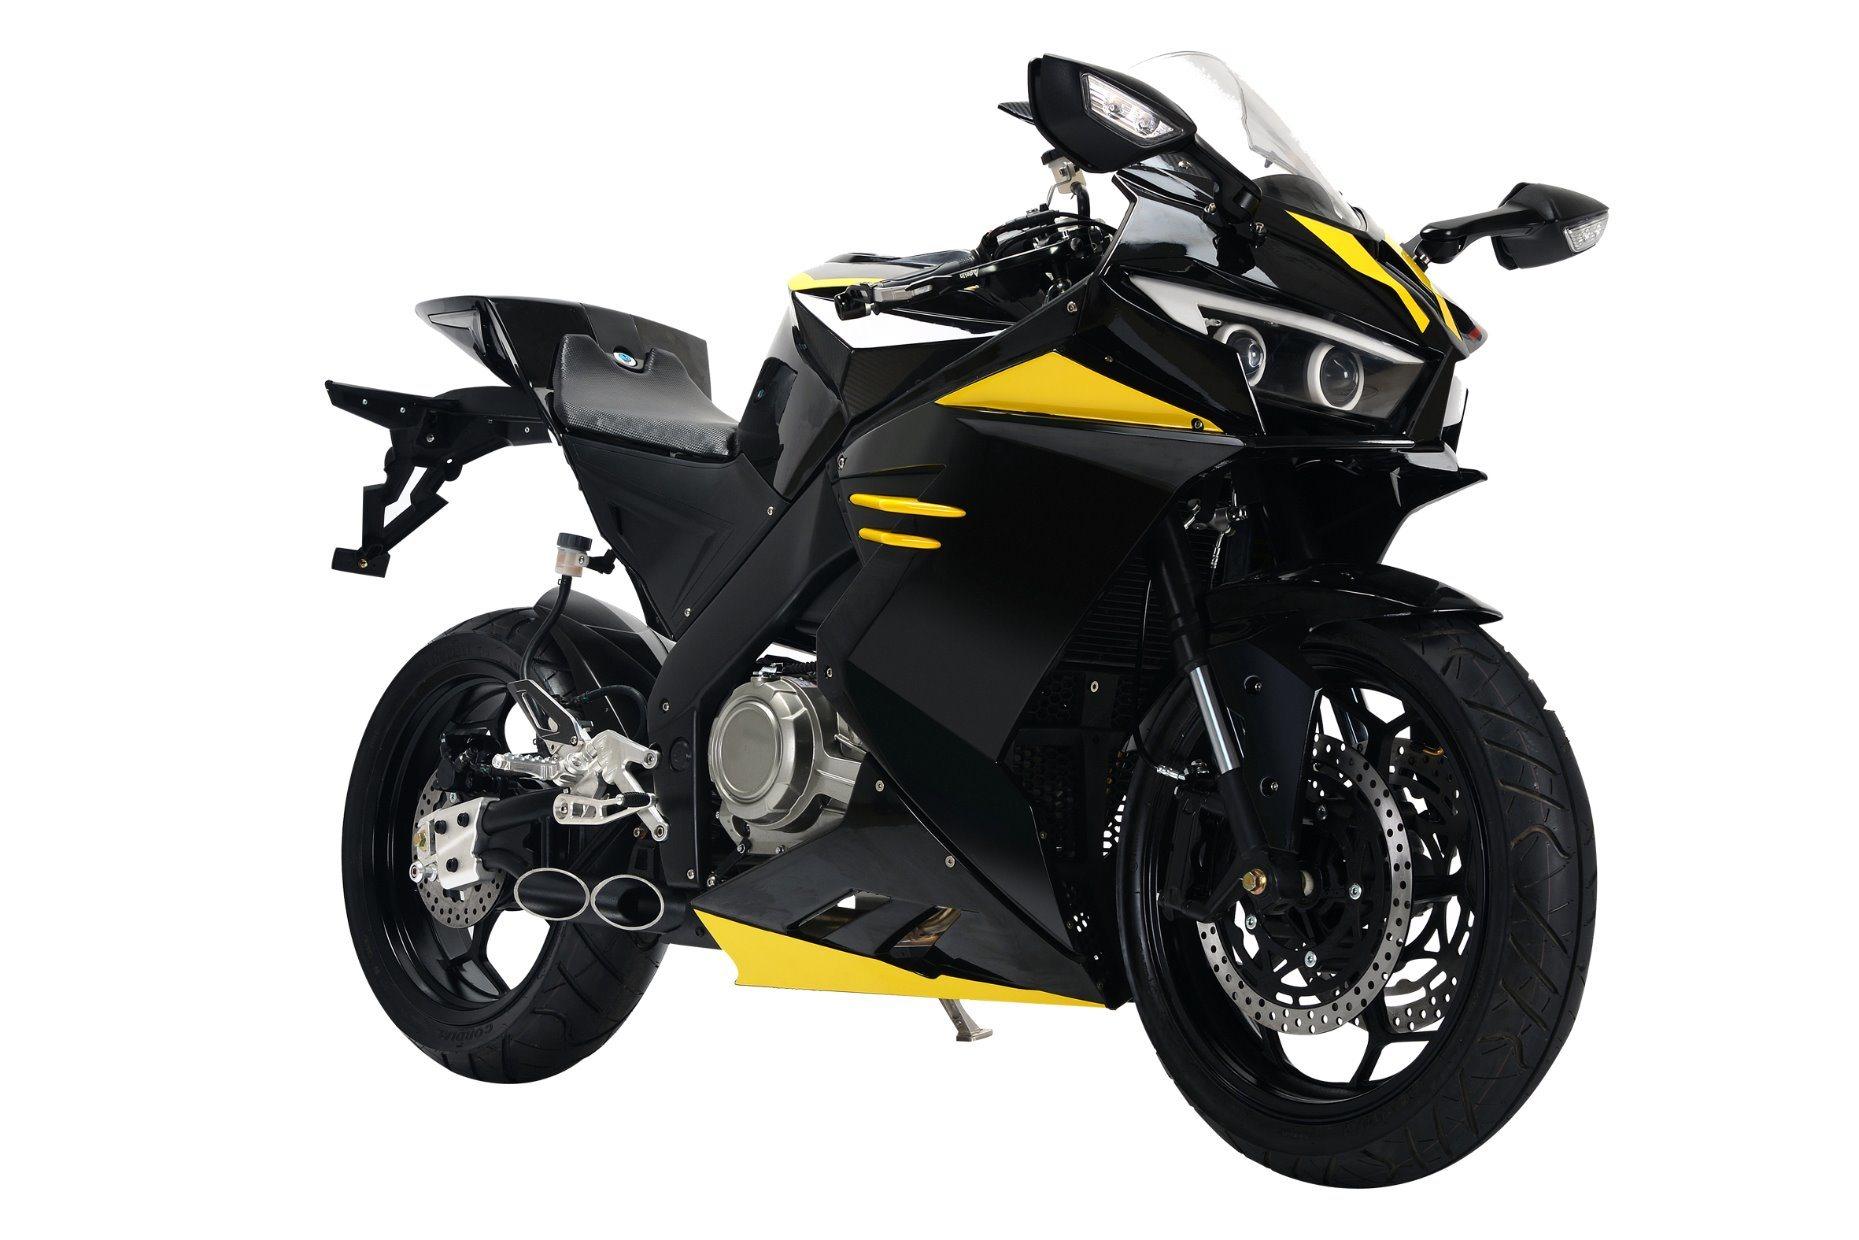 Racing Motorcycle, 300cc